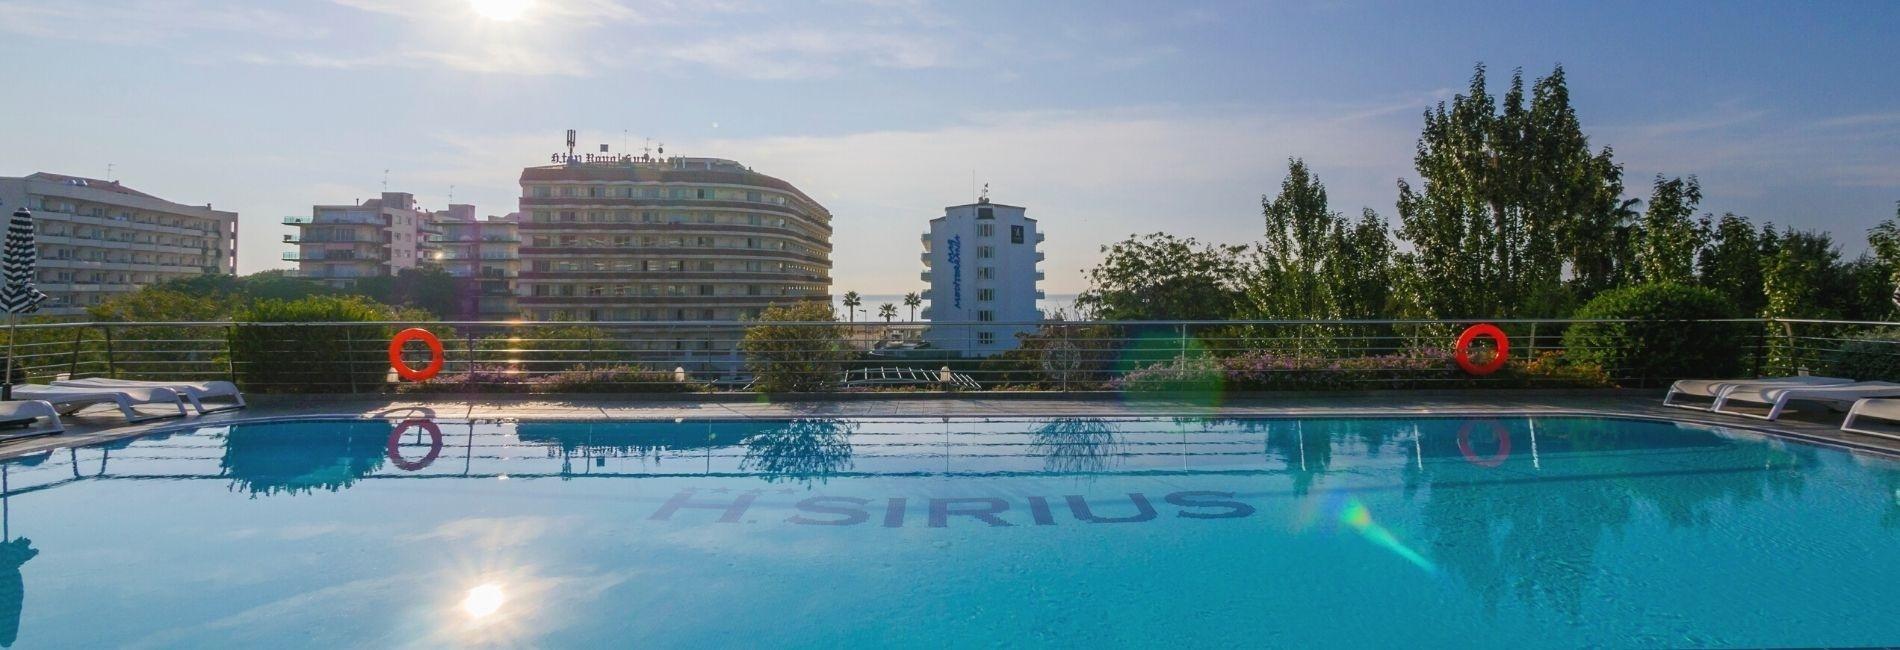 DWO Sirius by Checkin **** SUP | Santa Susanna - Barcelona | Web Oficial